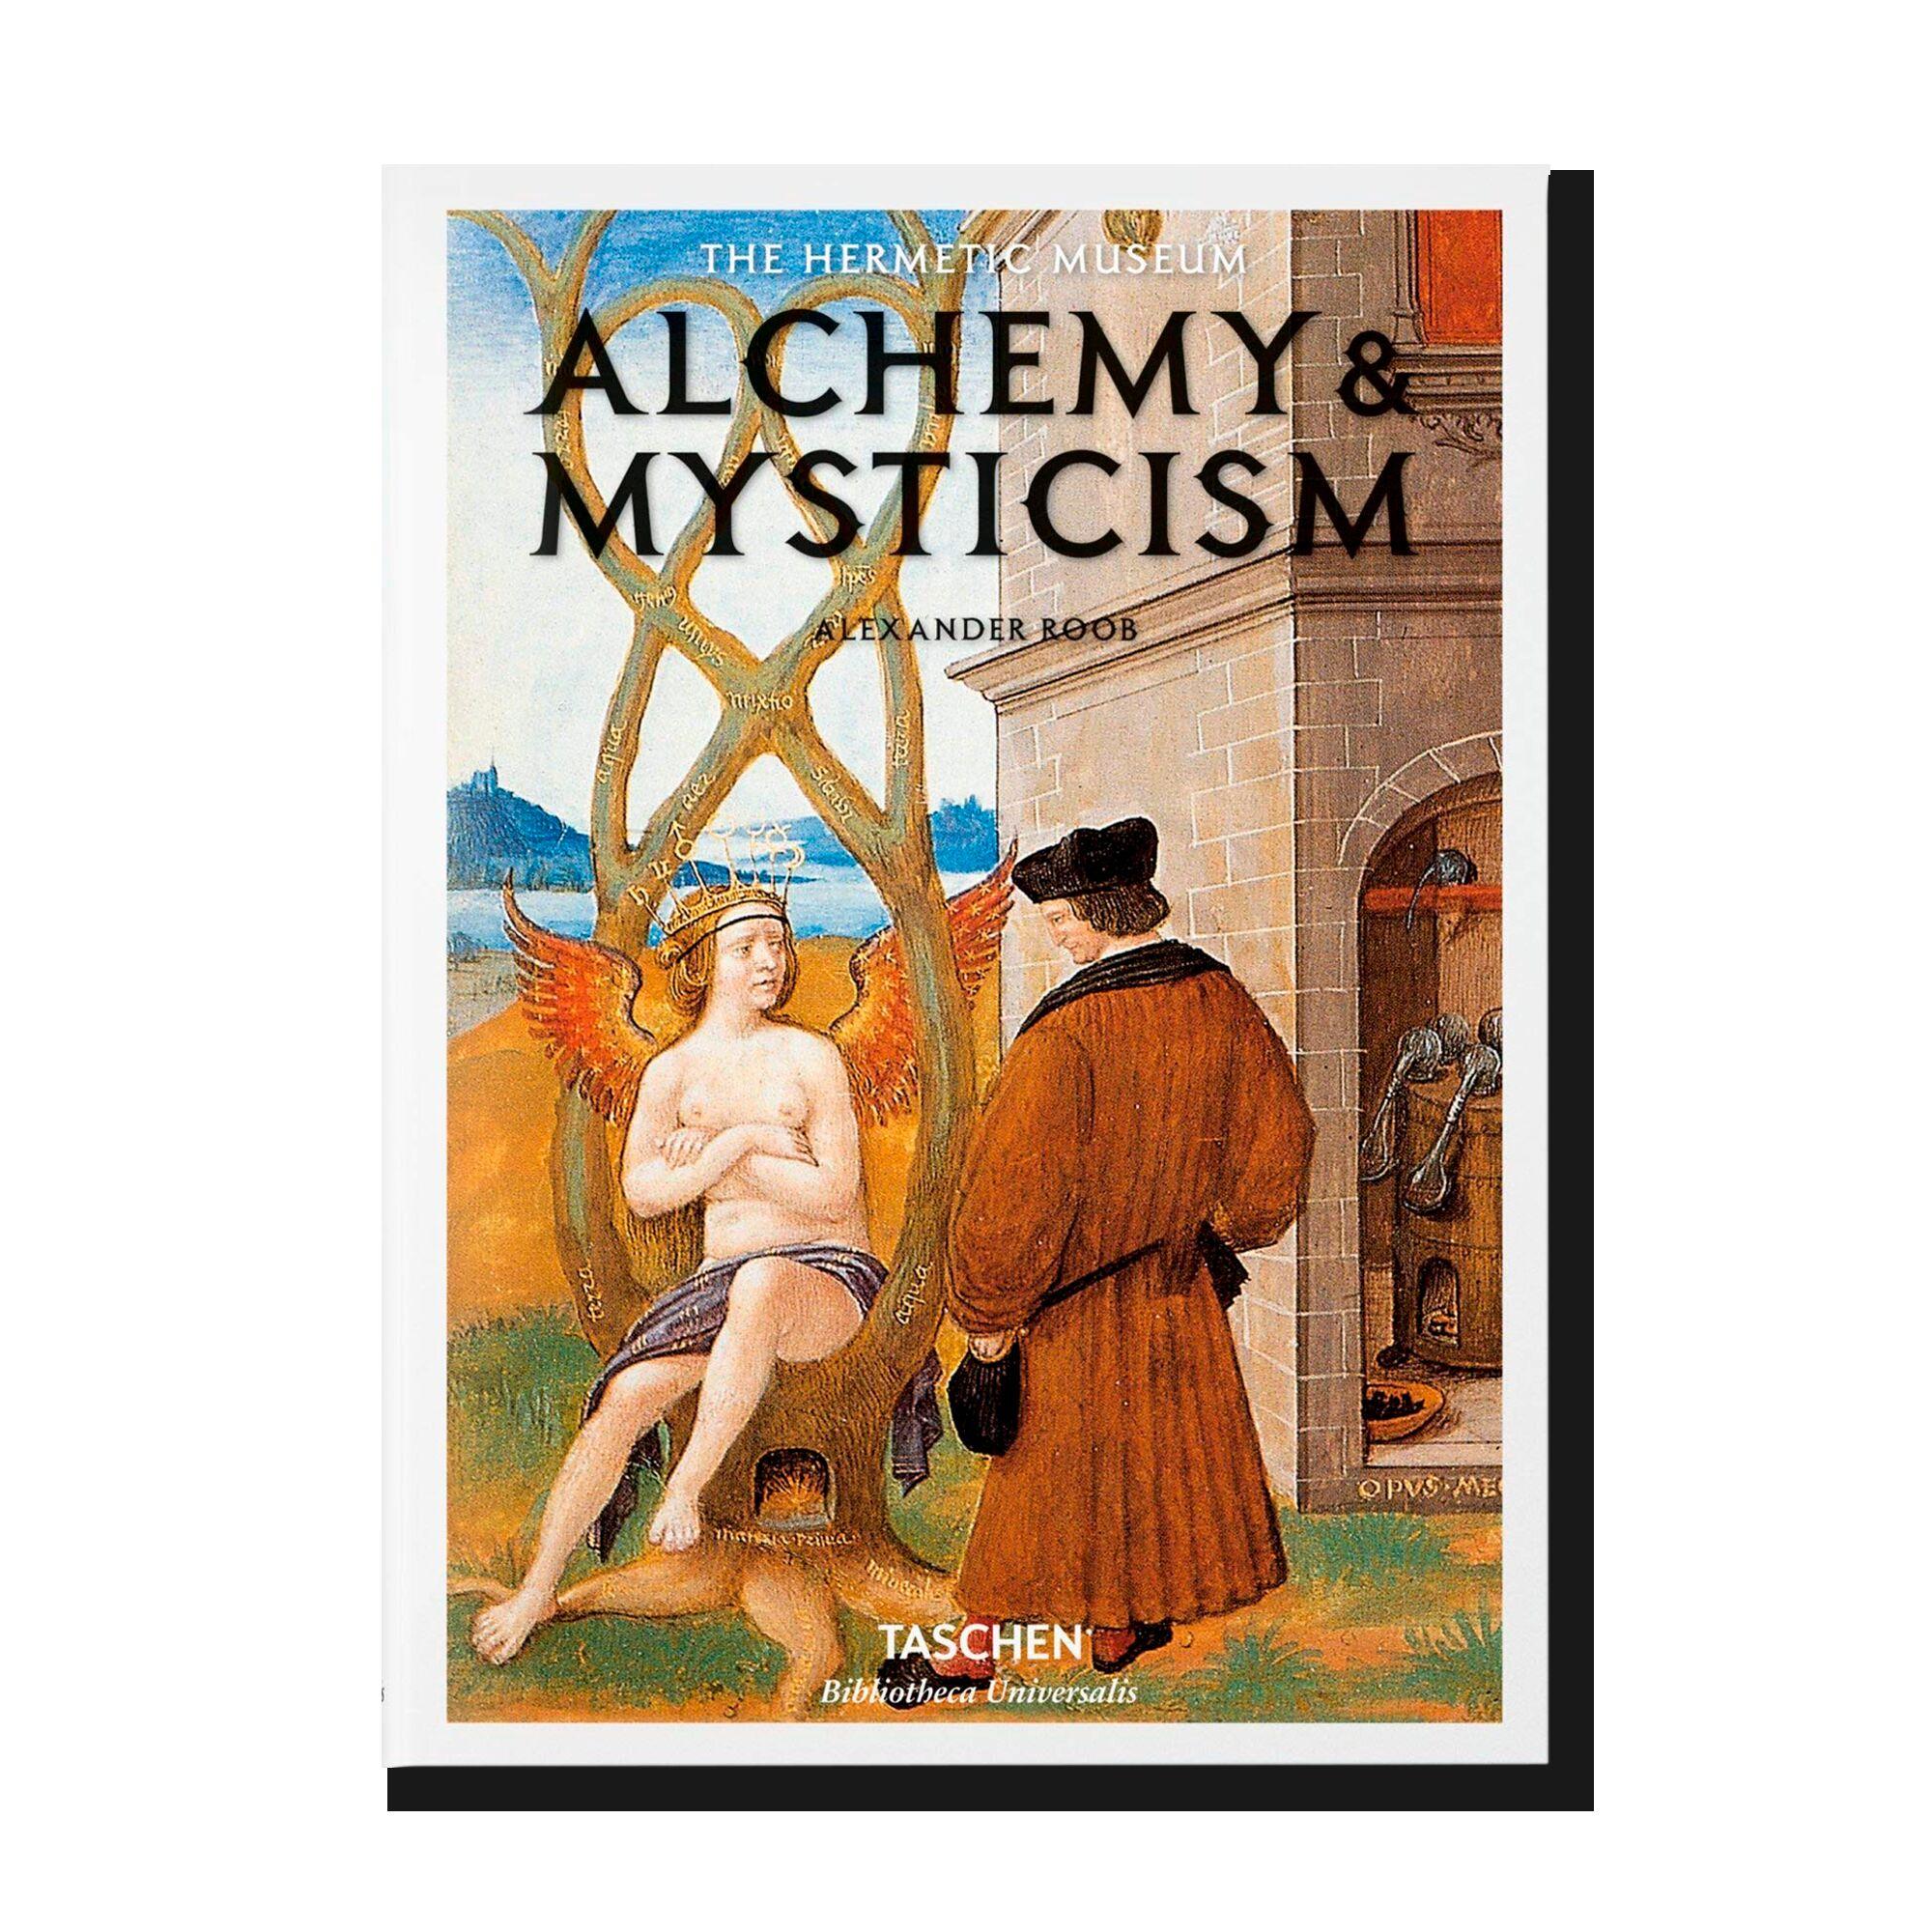 Alchemy & Mysticism (Biblioteca Universalis)